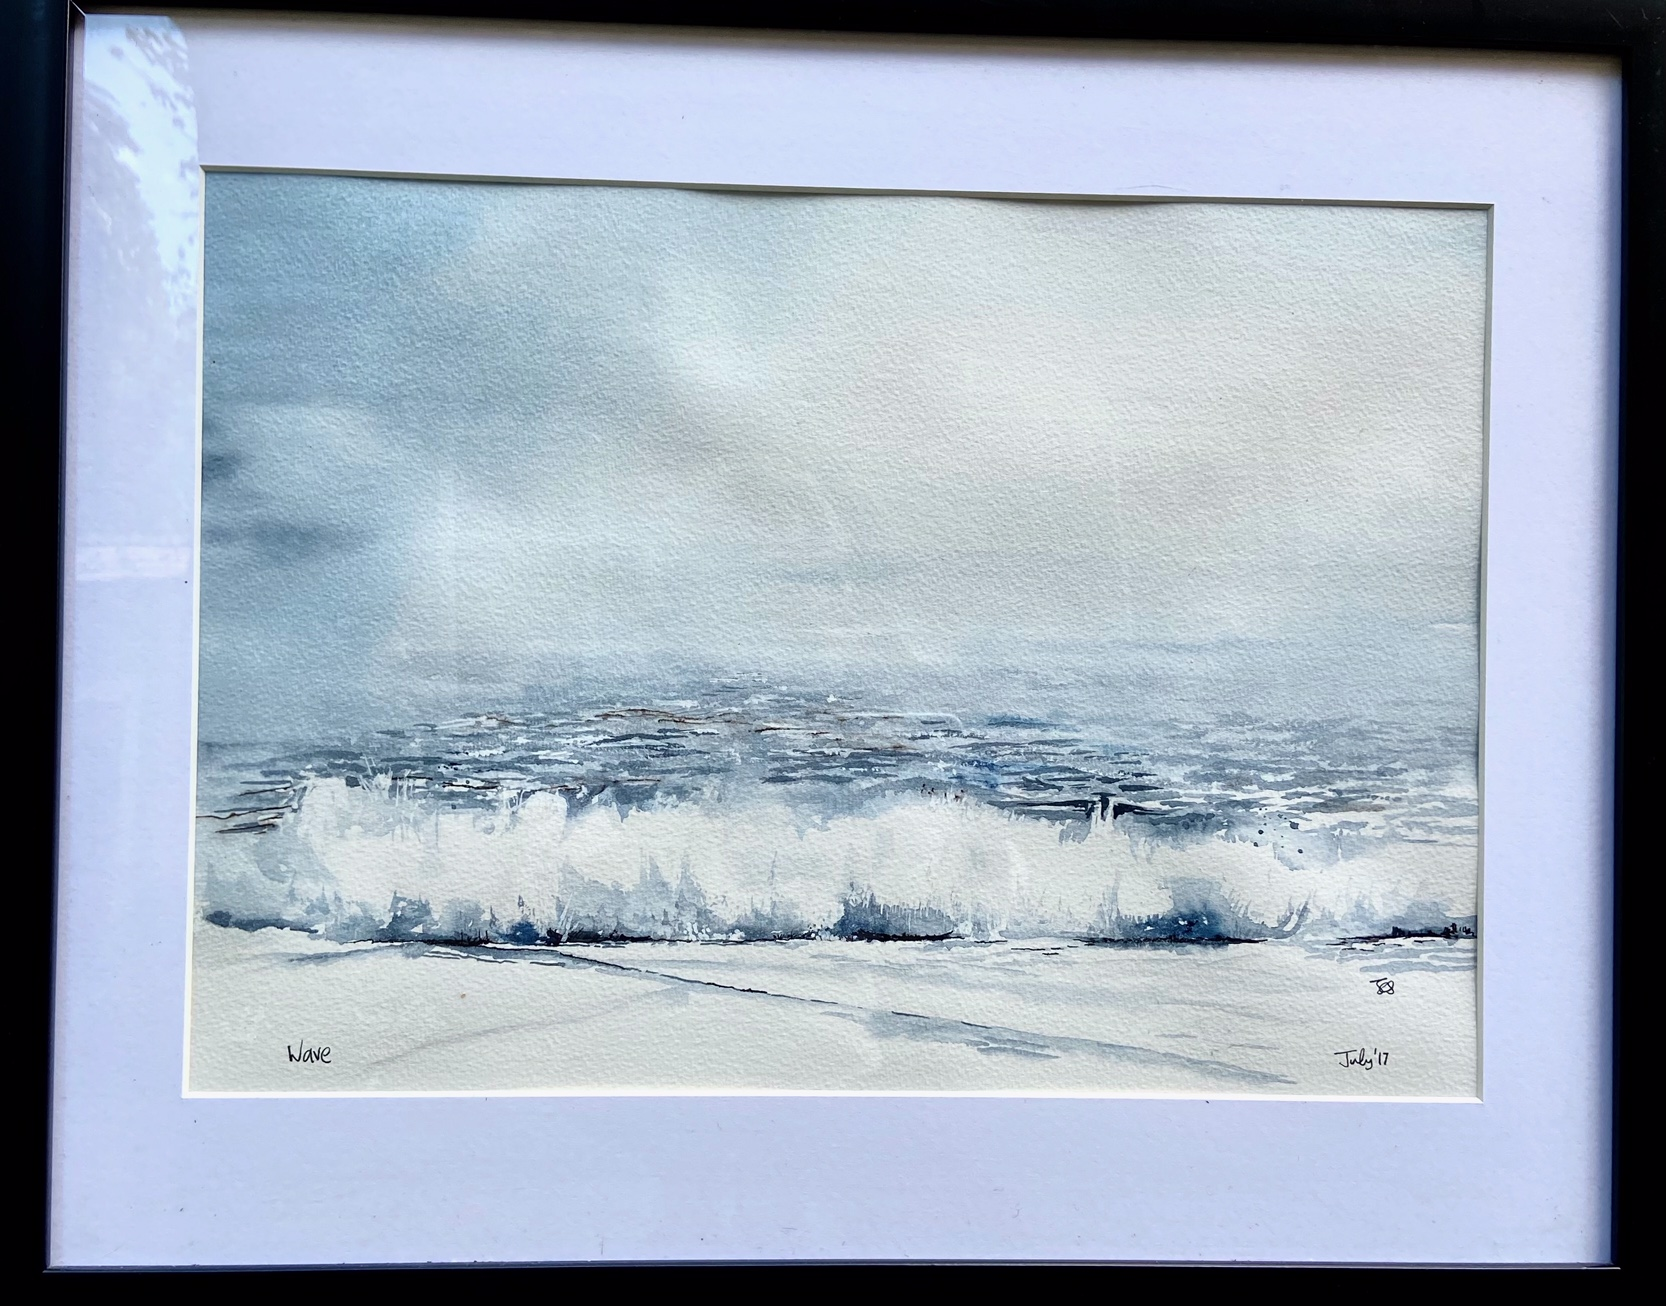 Hanford School-Art for the Art Barn Auction 42